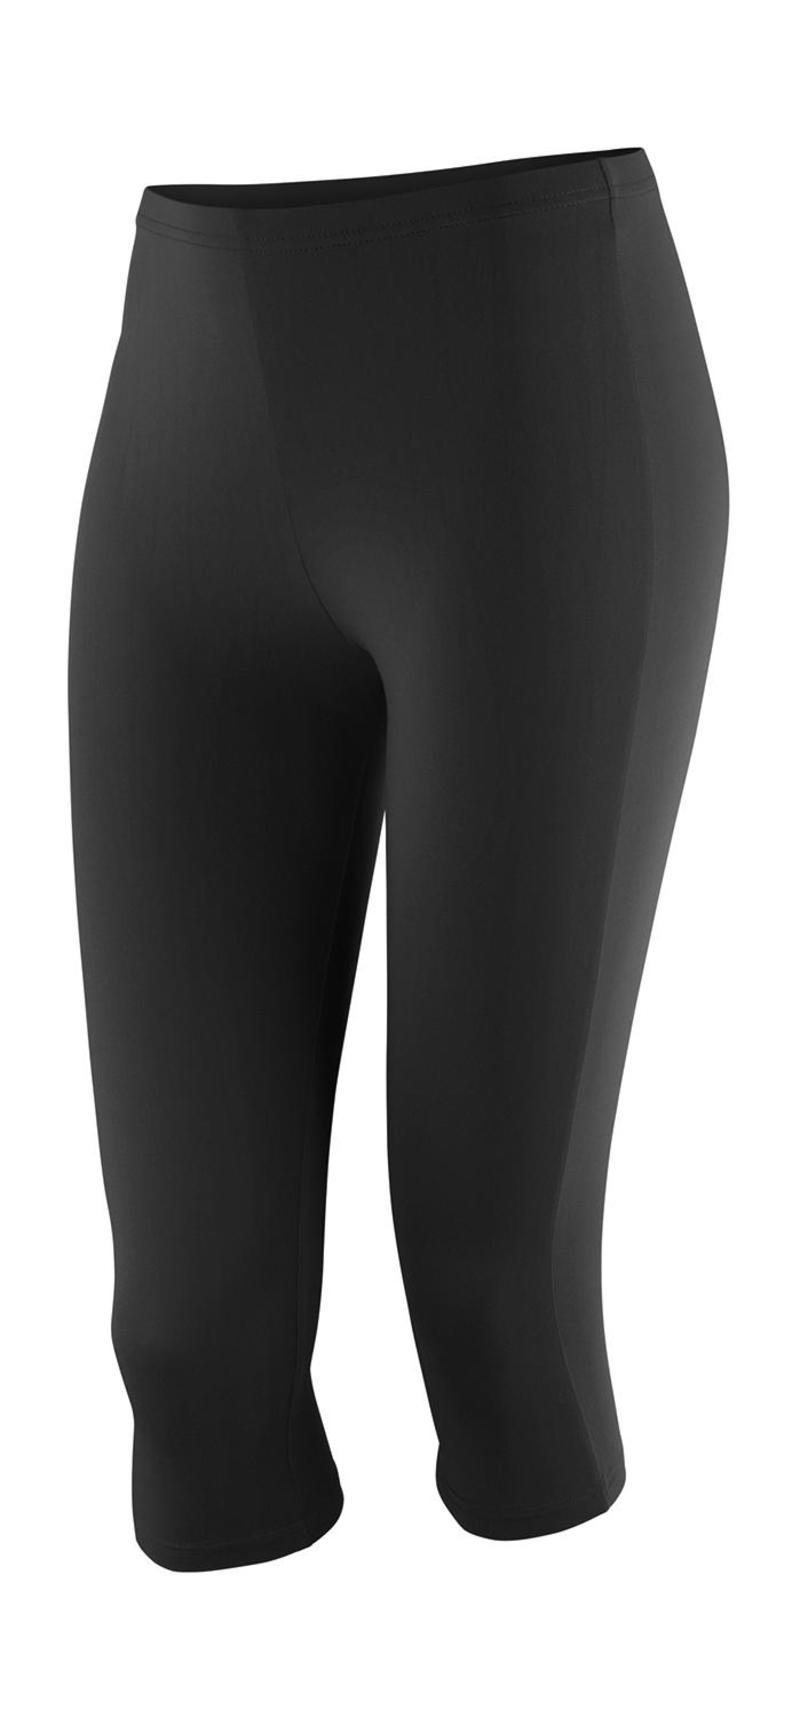 Women's Impact Softex® Capri Pants